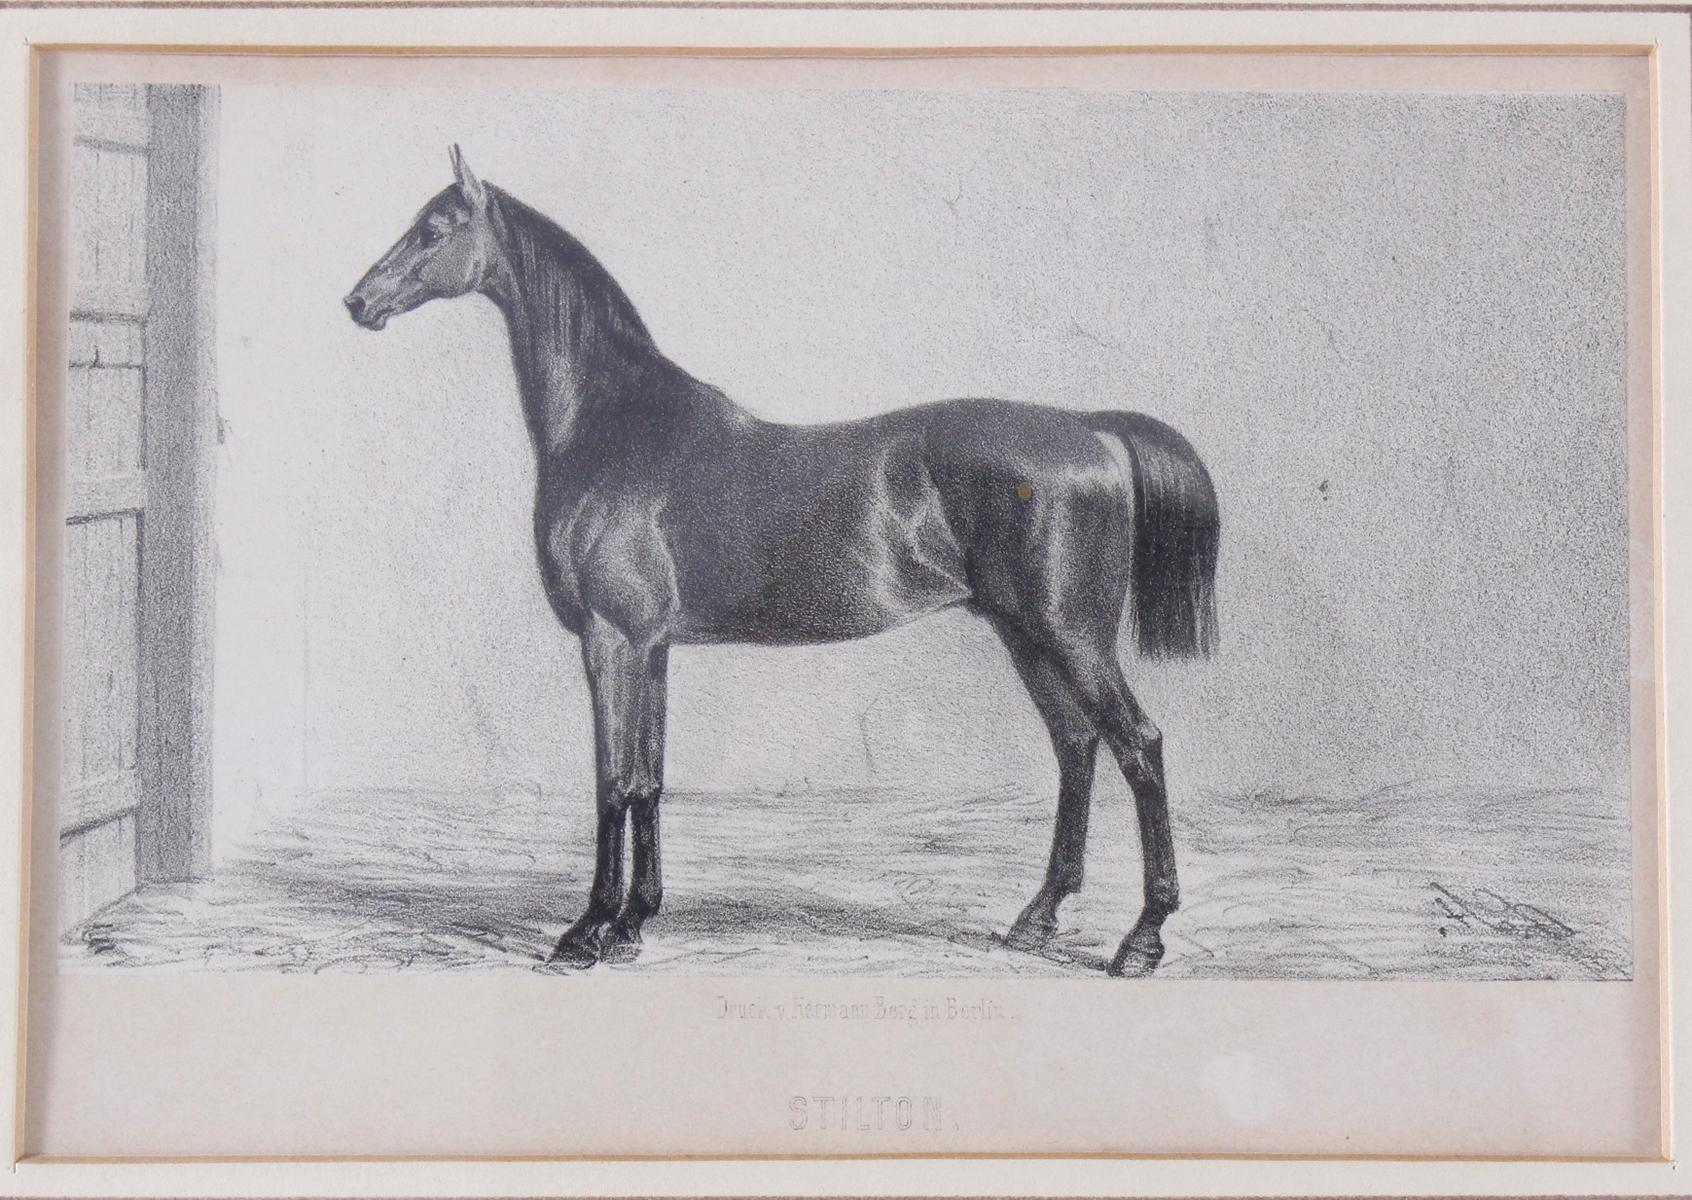 Konvolut Druckgrafiken zum Thema Pferde-2